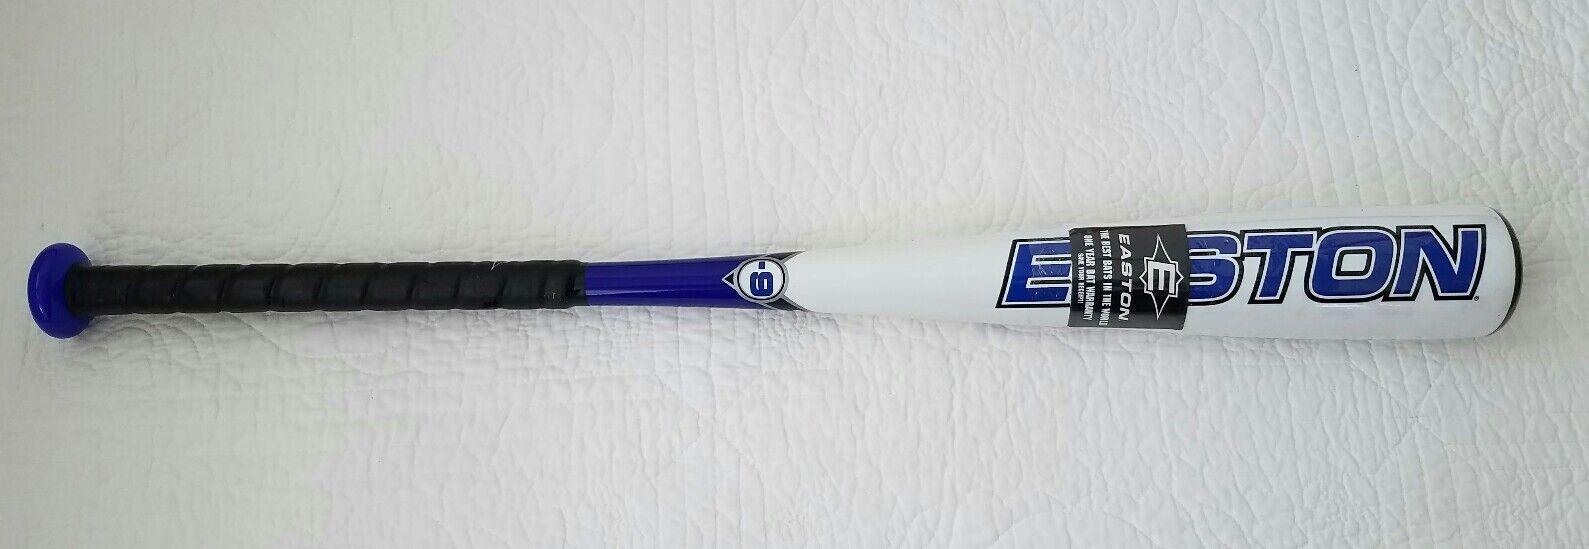 New Easton Youth Baseball Bat -9, 28 inches, 19oz, 2 5 8 in bar - Model BZ275